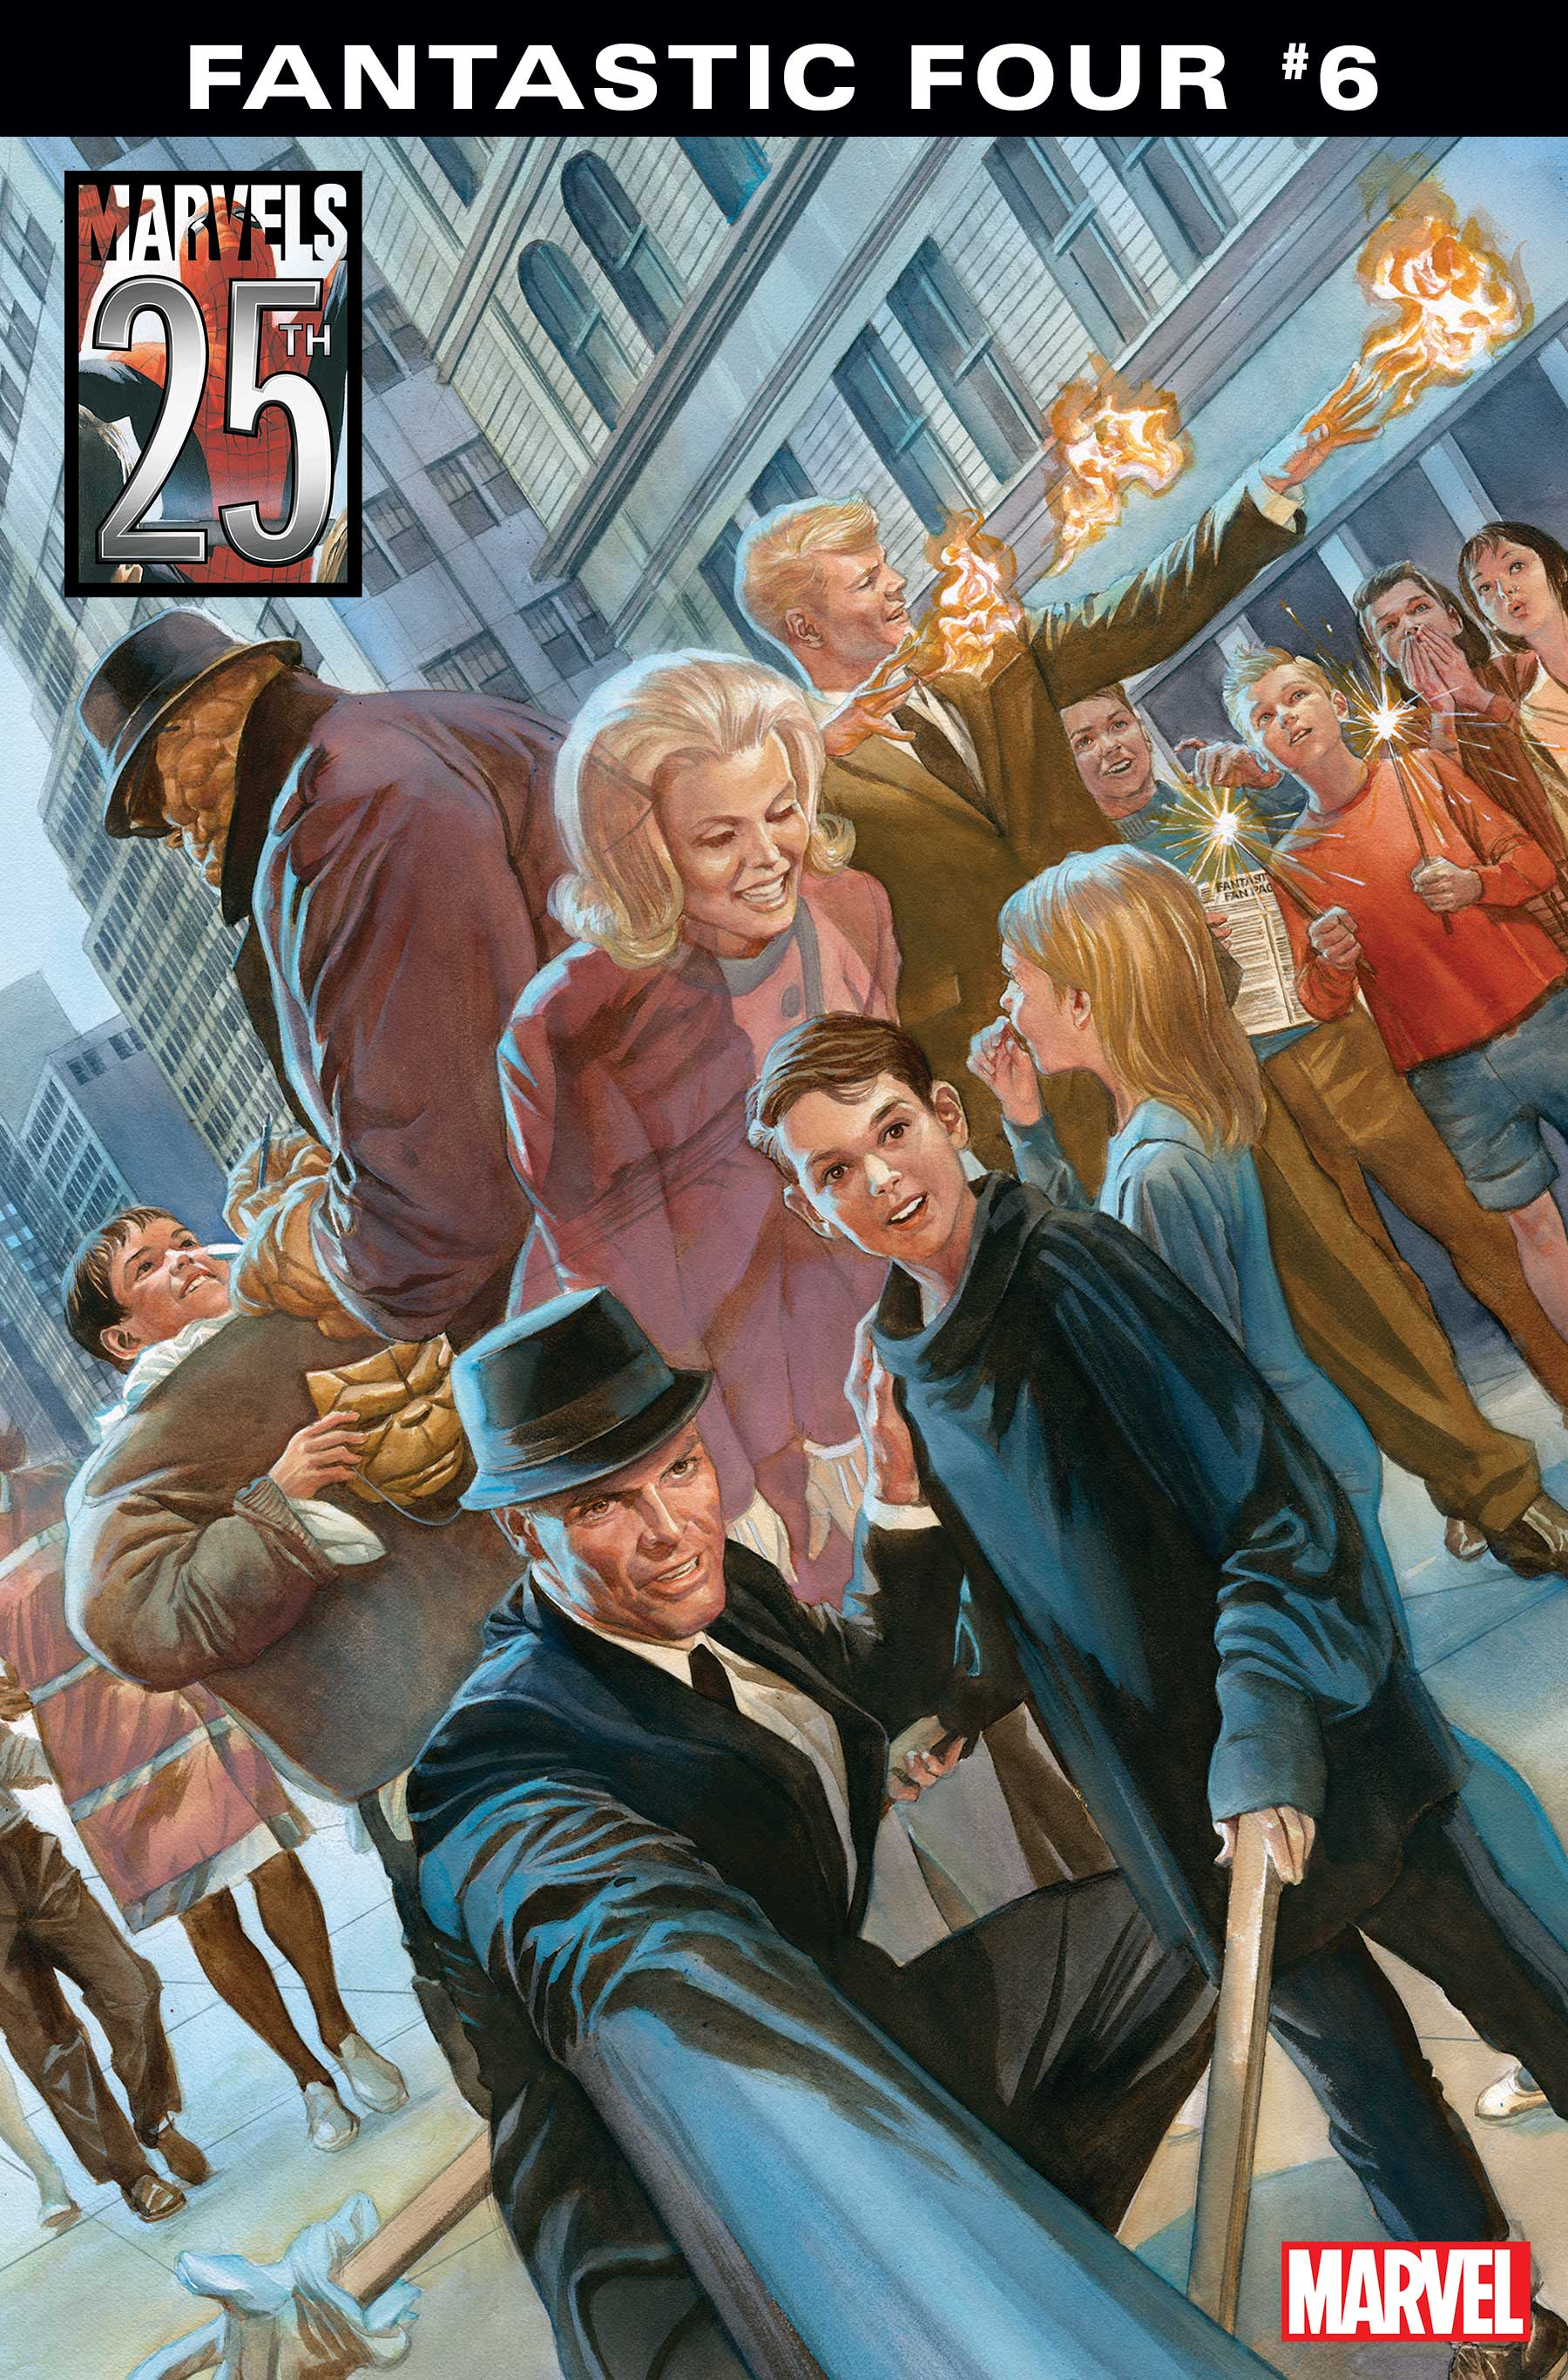 Fantastic Four by Dan Slott Vol. 2: Mr. and Mrs. Grimm Review